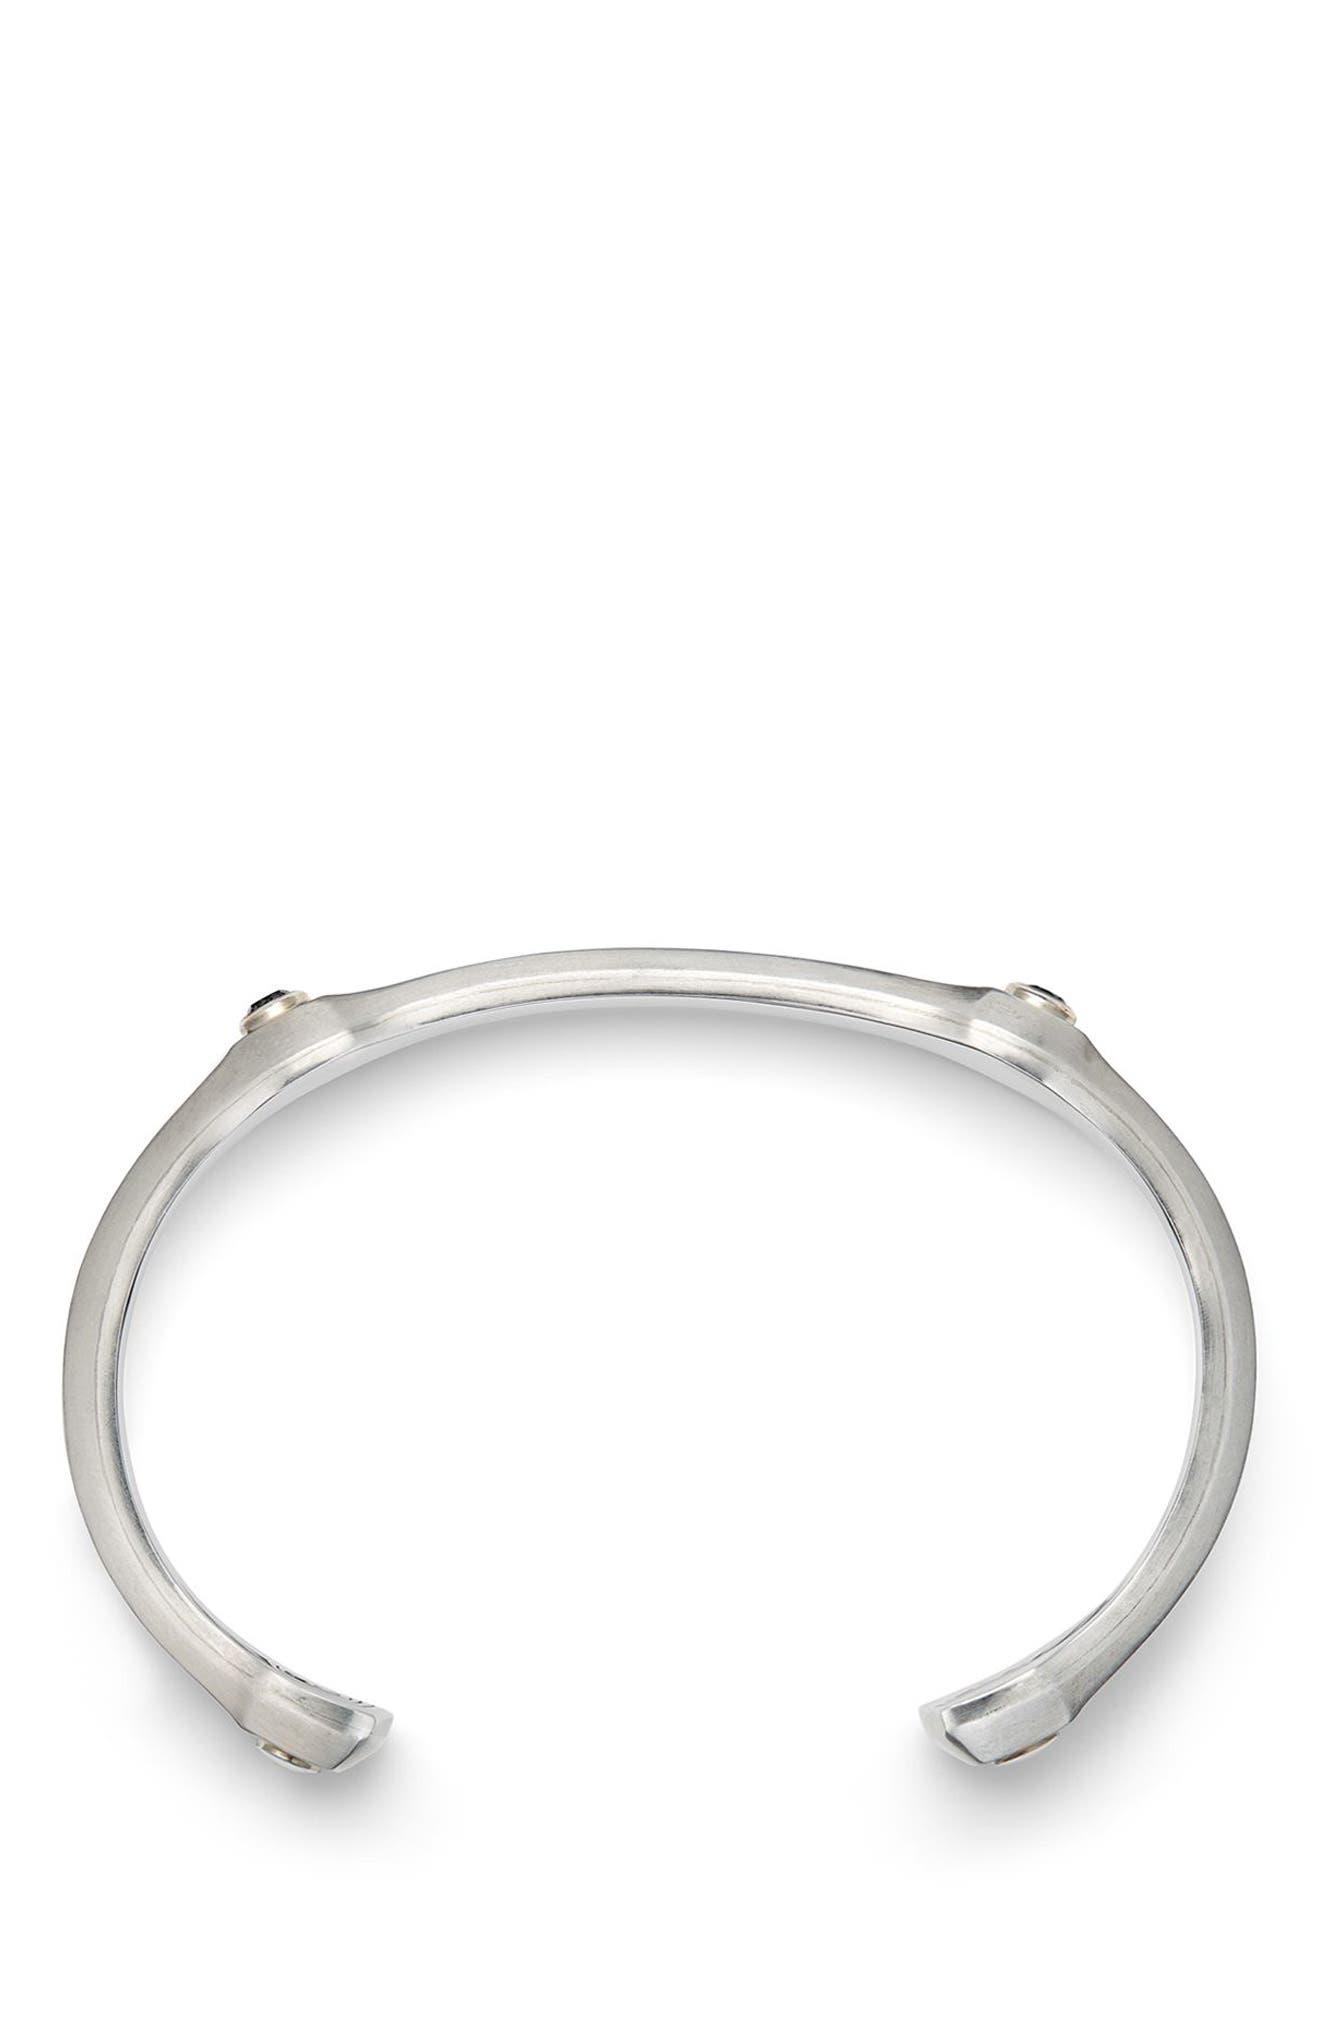 Anvil Cuff Bracelet with Black Diamond, 10.5mm,                             Alternate thumbnail 3, color,                             SILVER/ BLACK DIAMOND